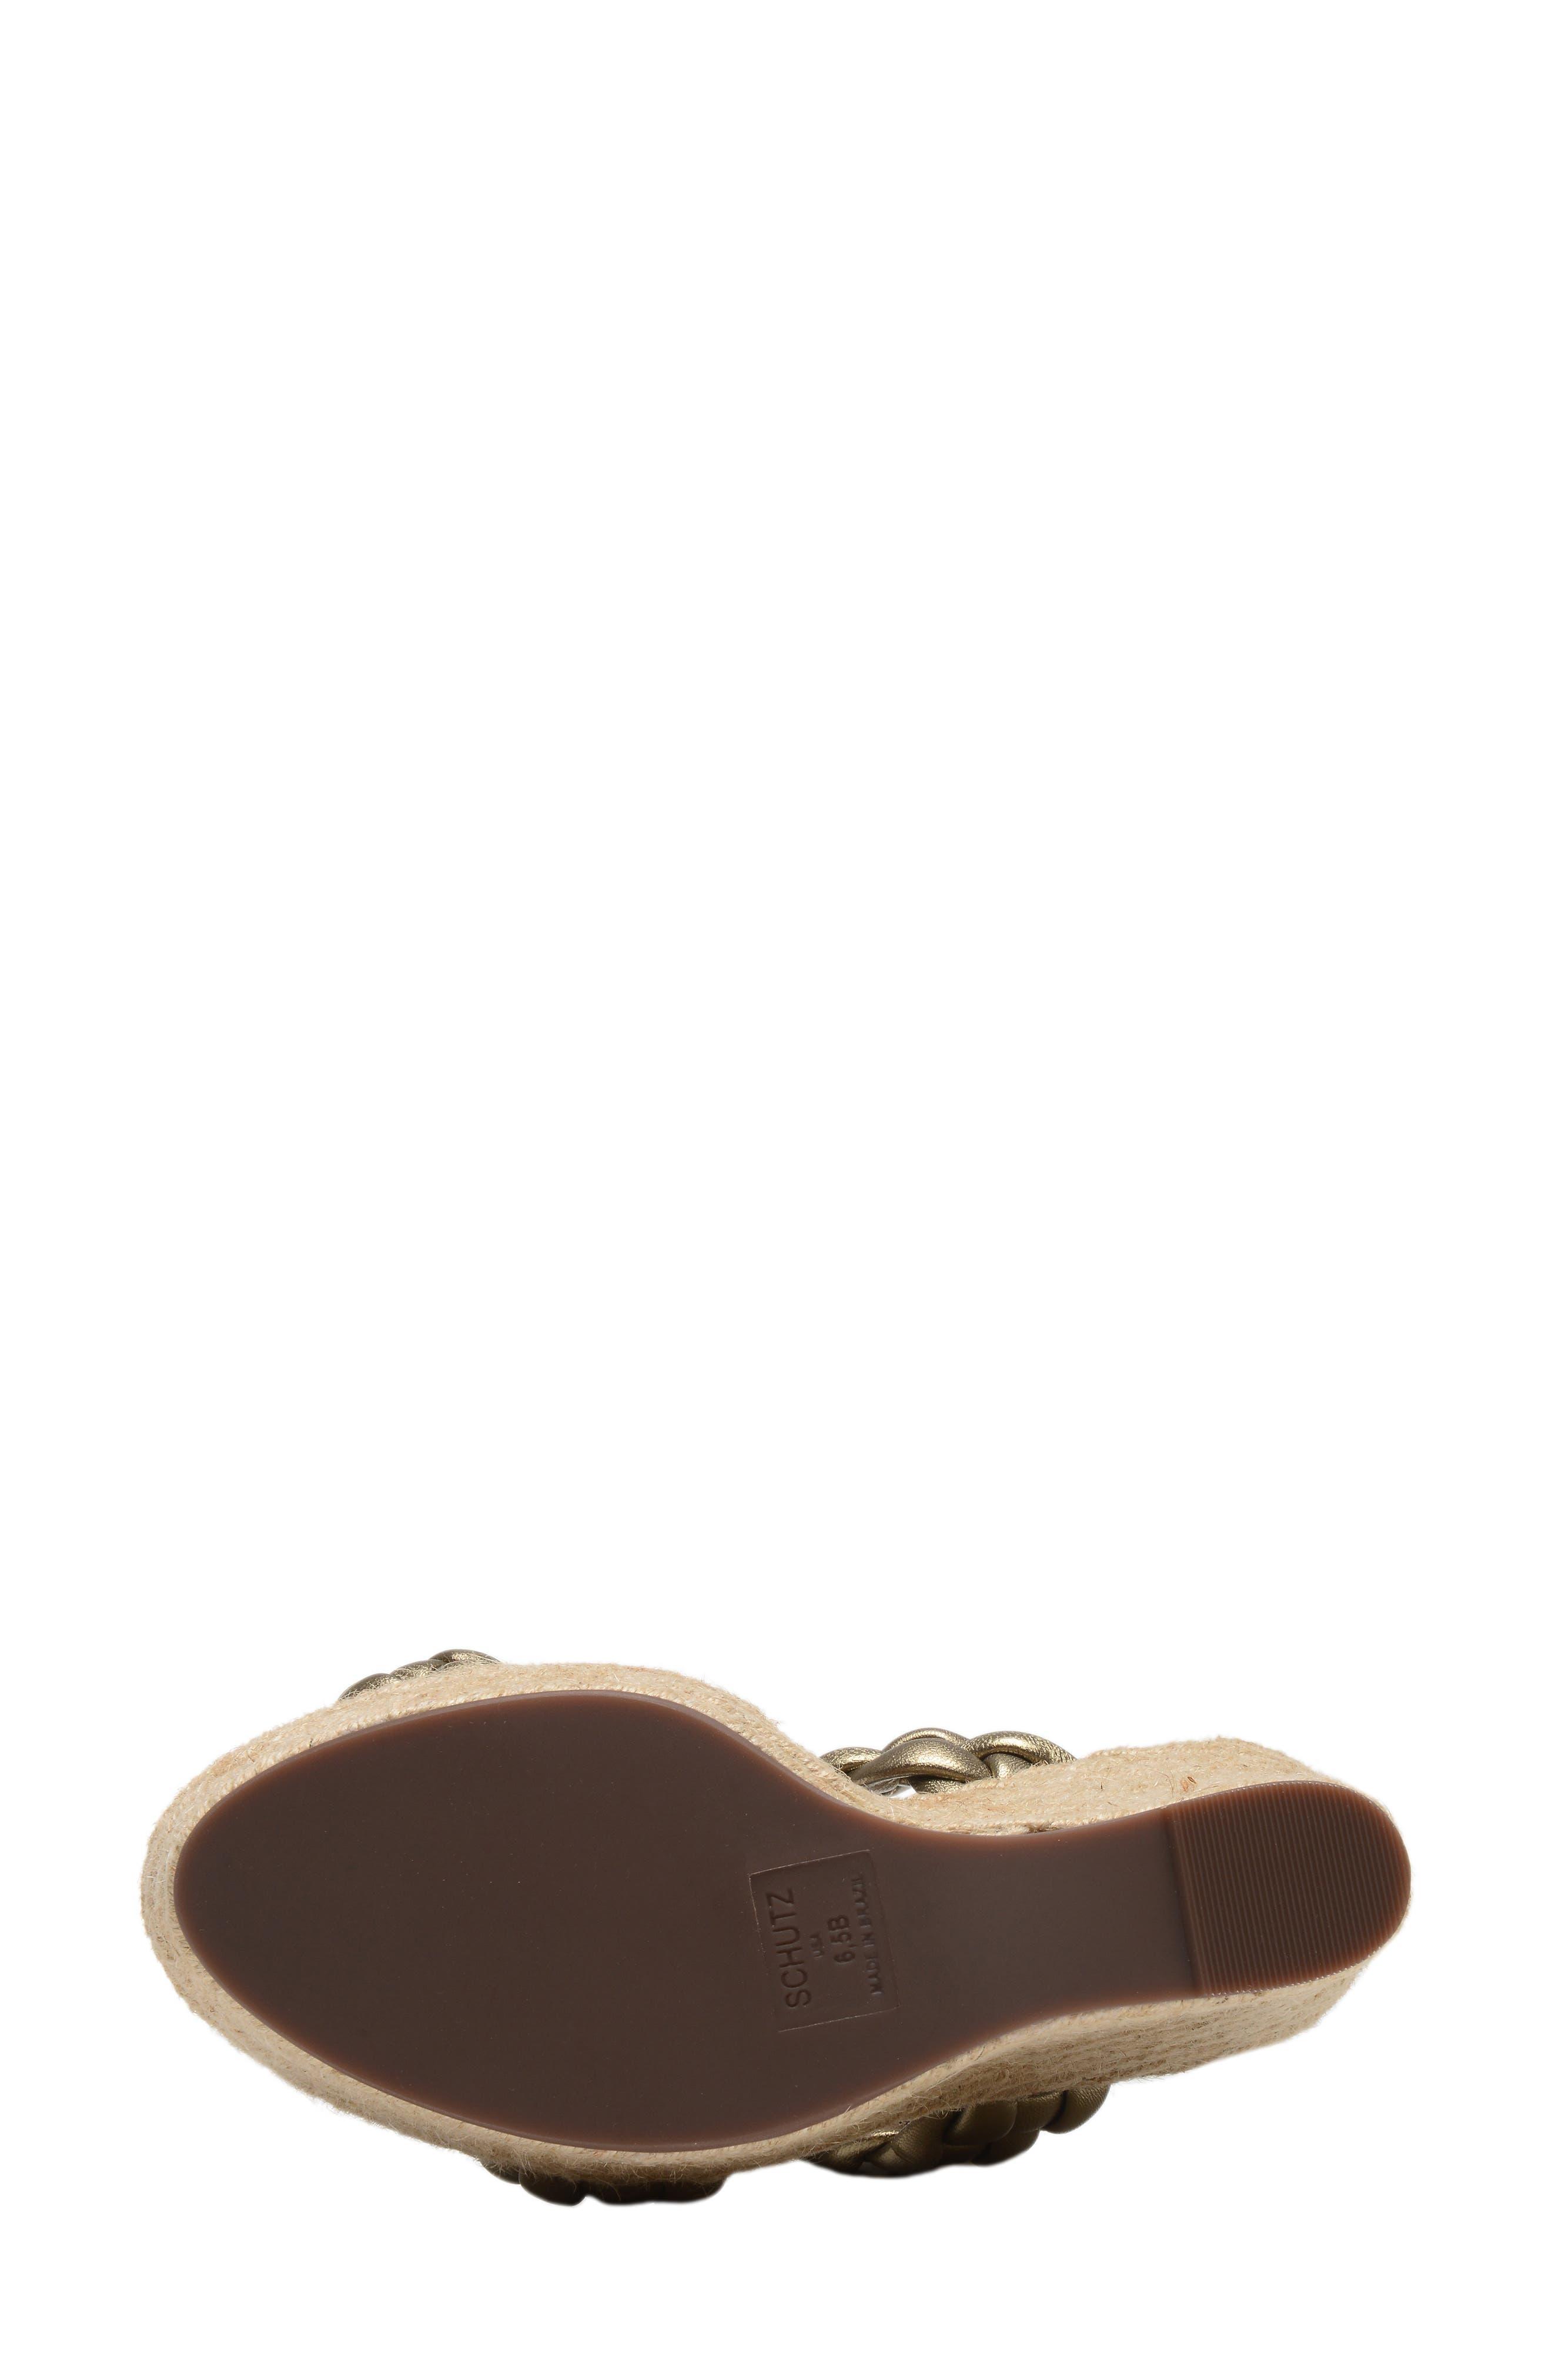 SCHUTZ, Dyandre Platform Wedge Slide Sandal, Alternate thumbnail 6, color, ALE WASH